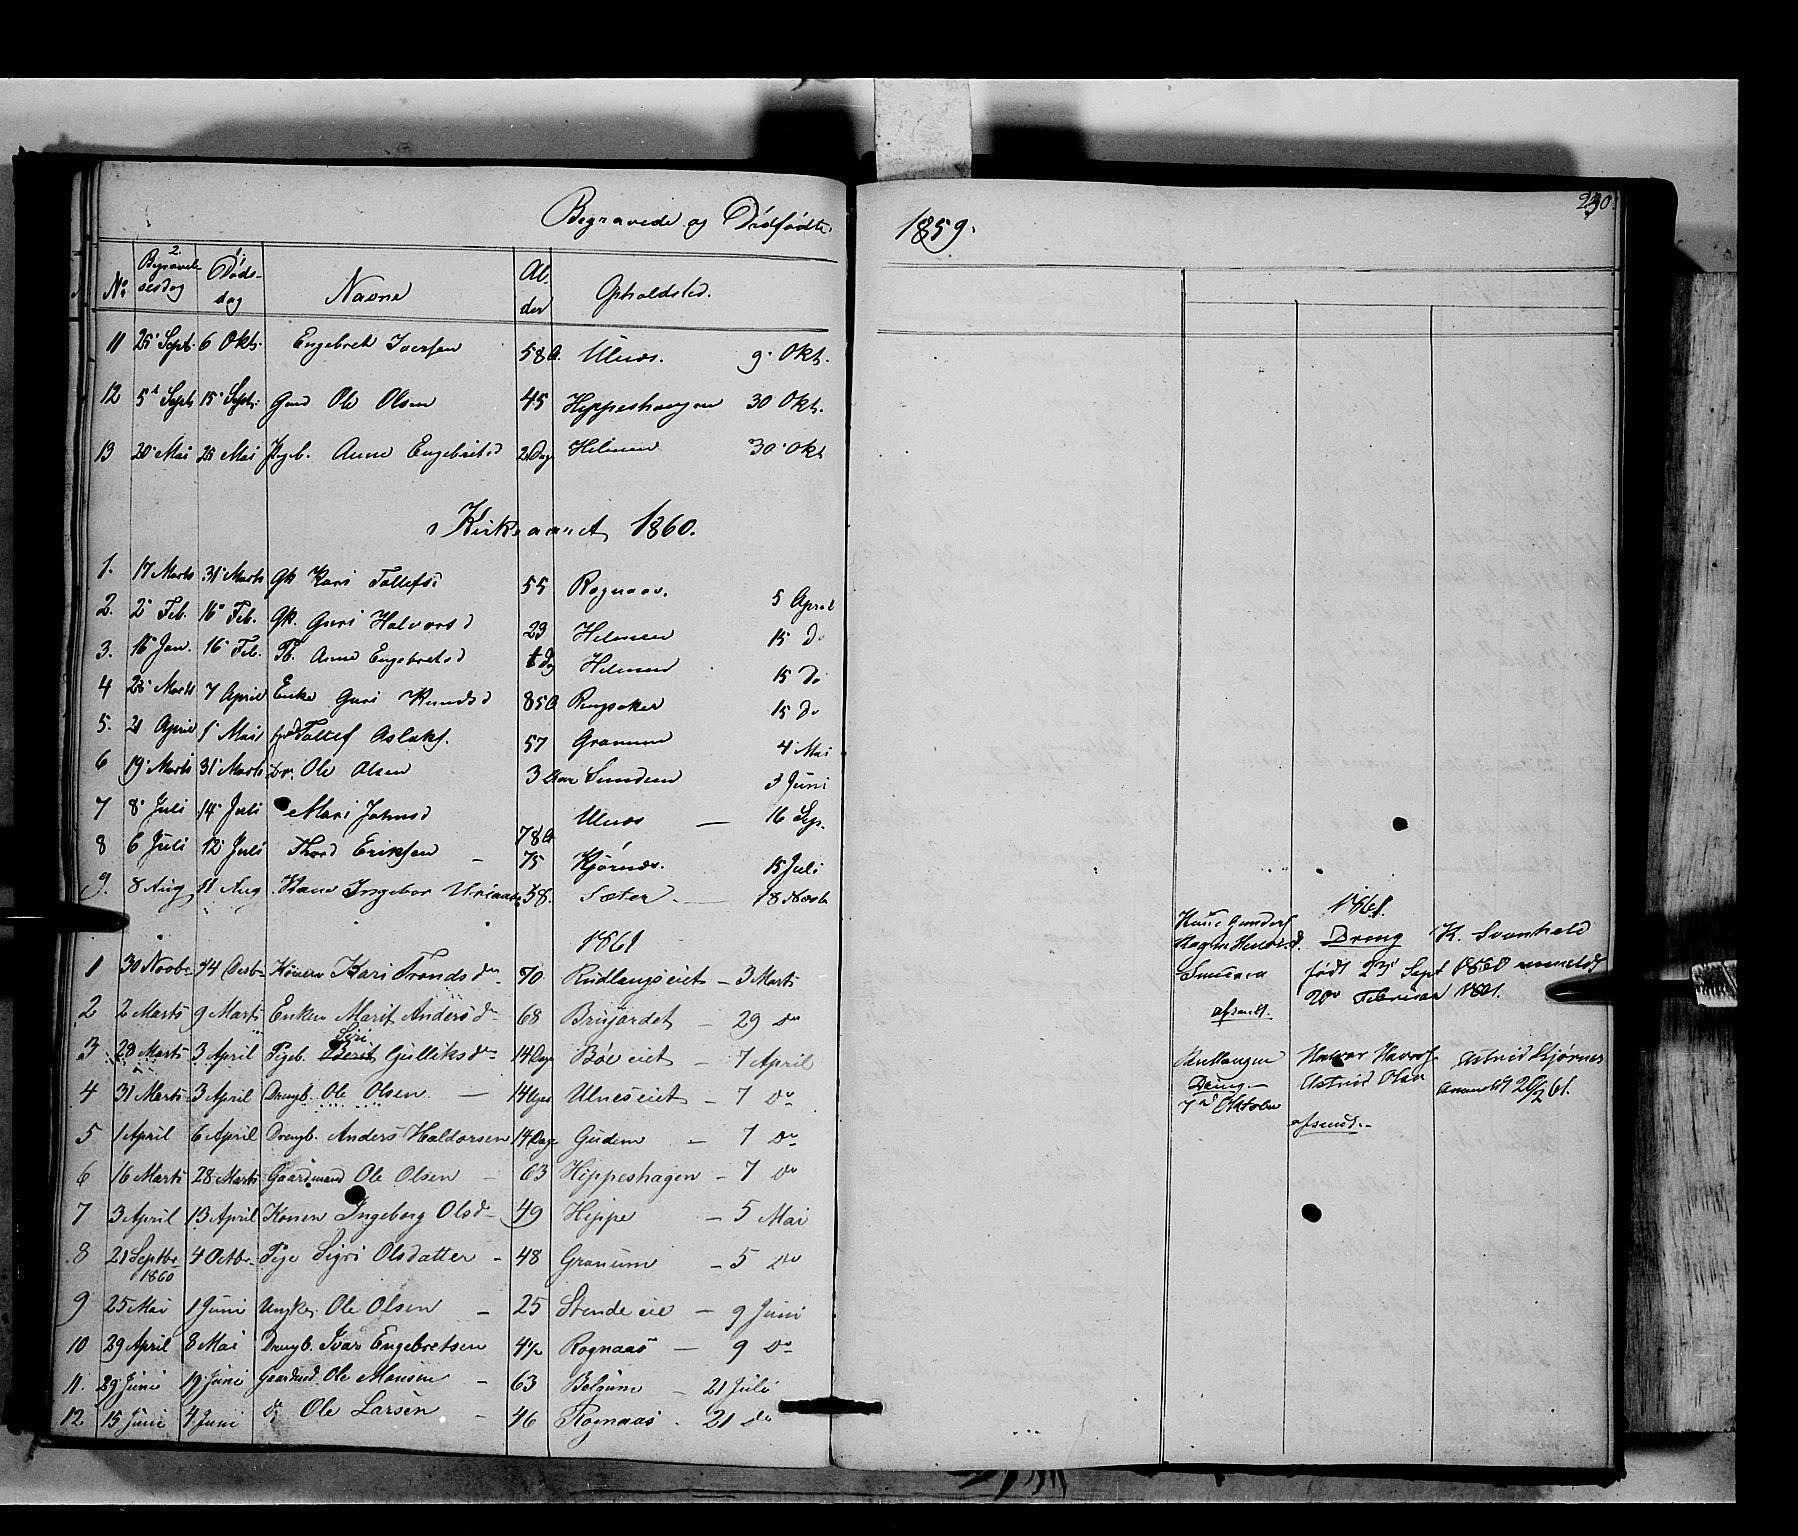 SAH, Nord-Aurdal prestekontor, Ministerialbok nr. 6, 1842-1863, s. 230